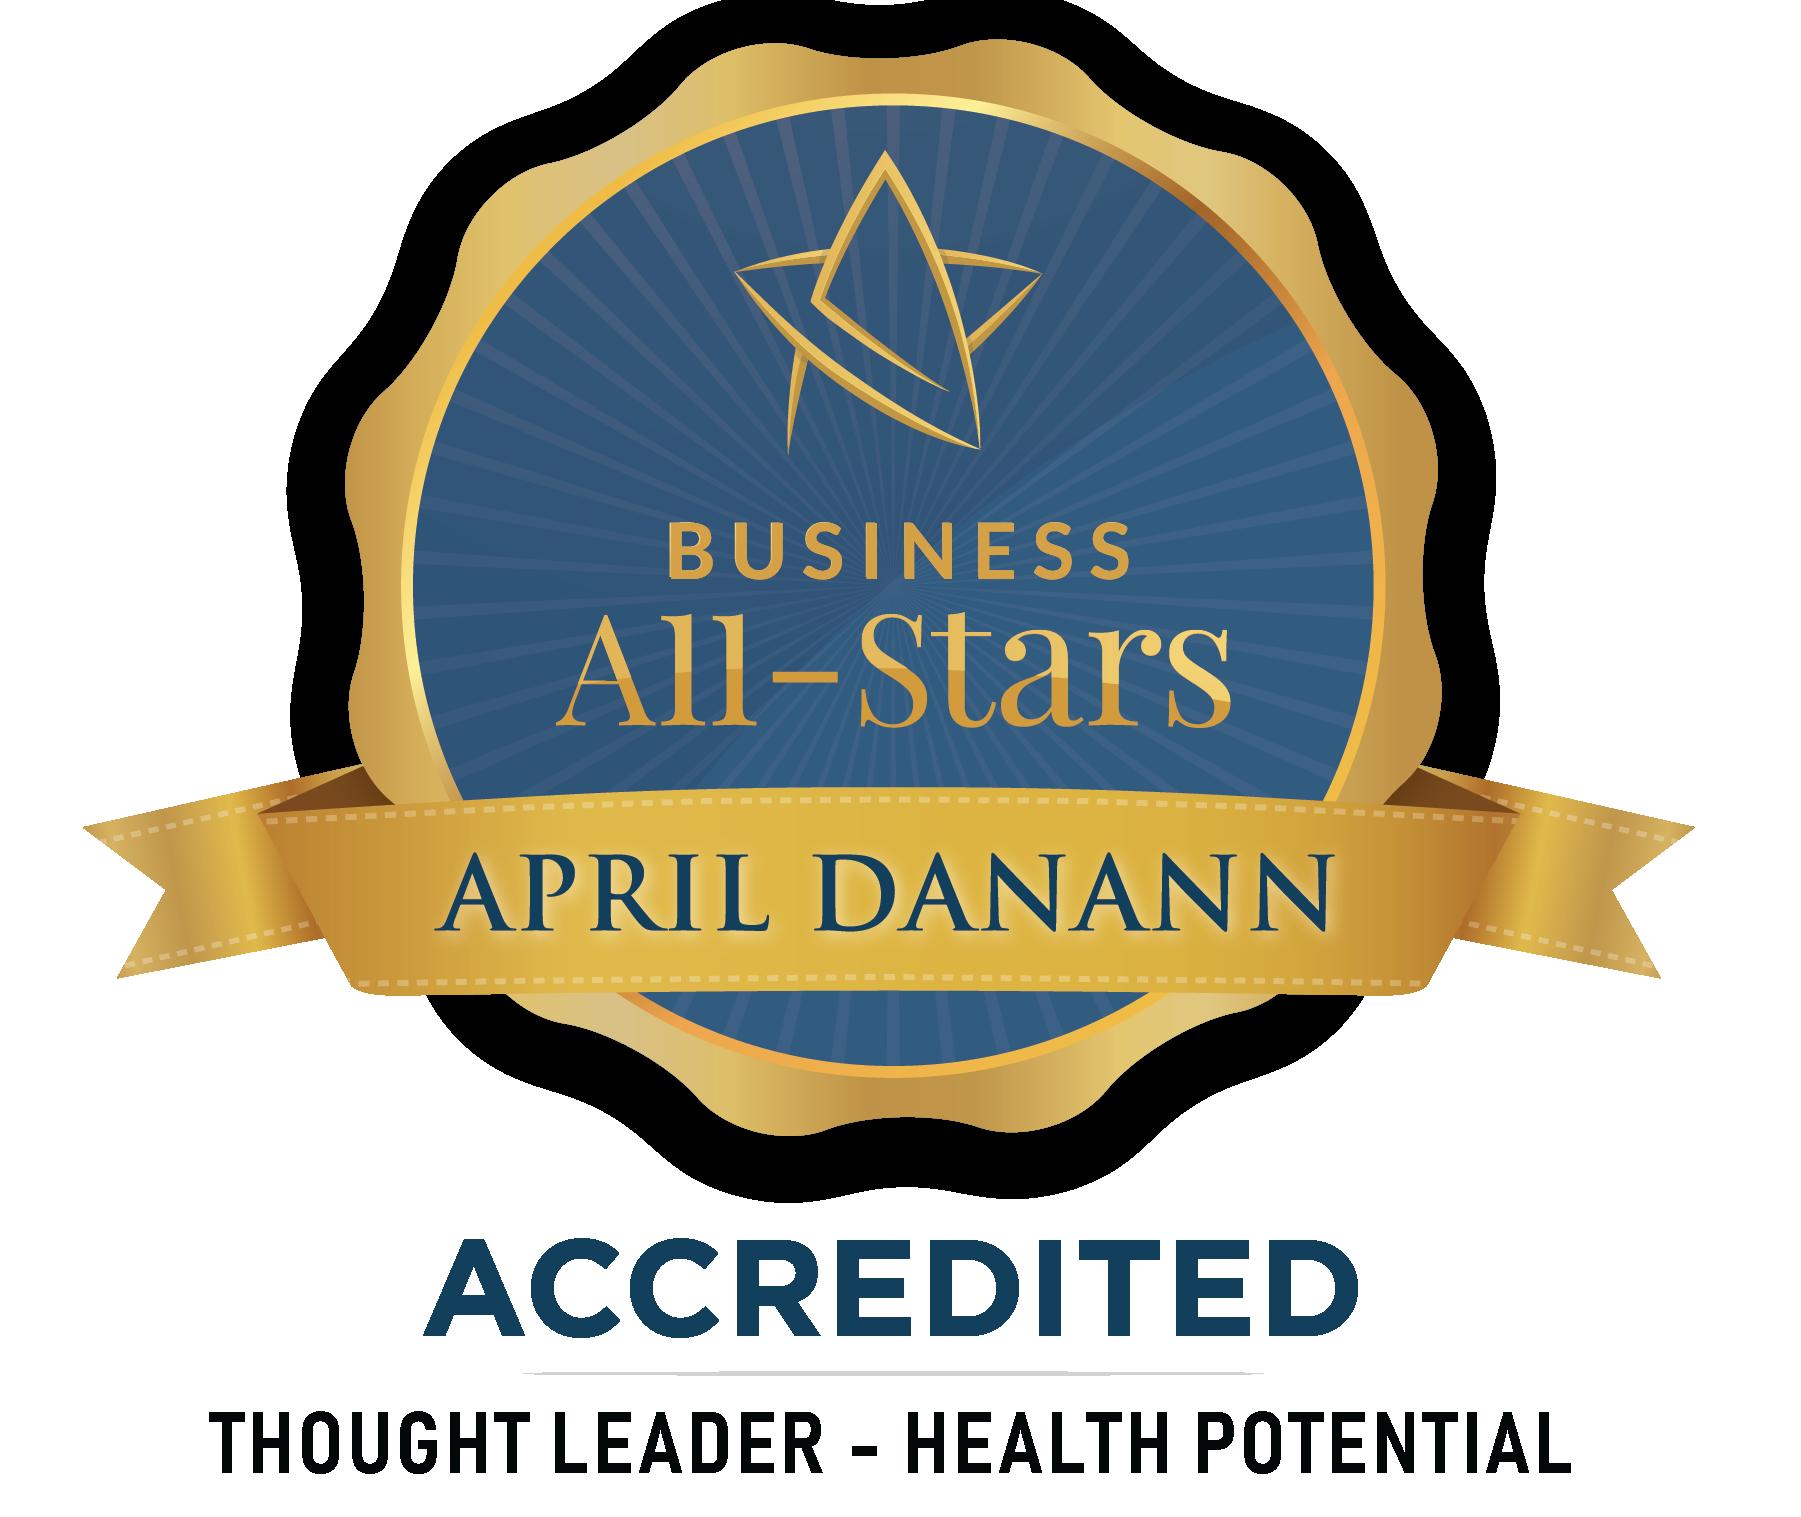 April-Danann-all-star-seal .png